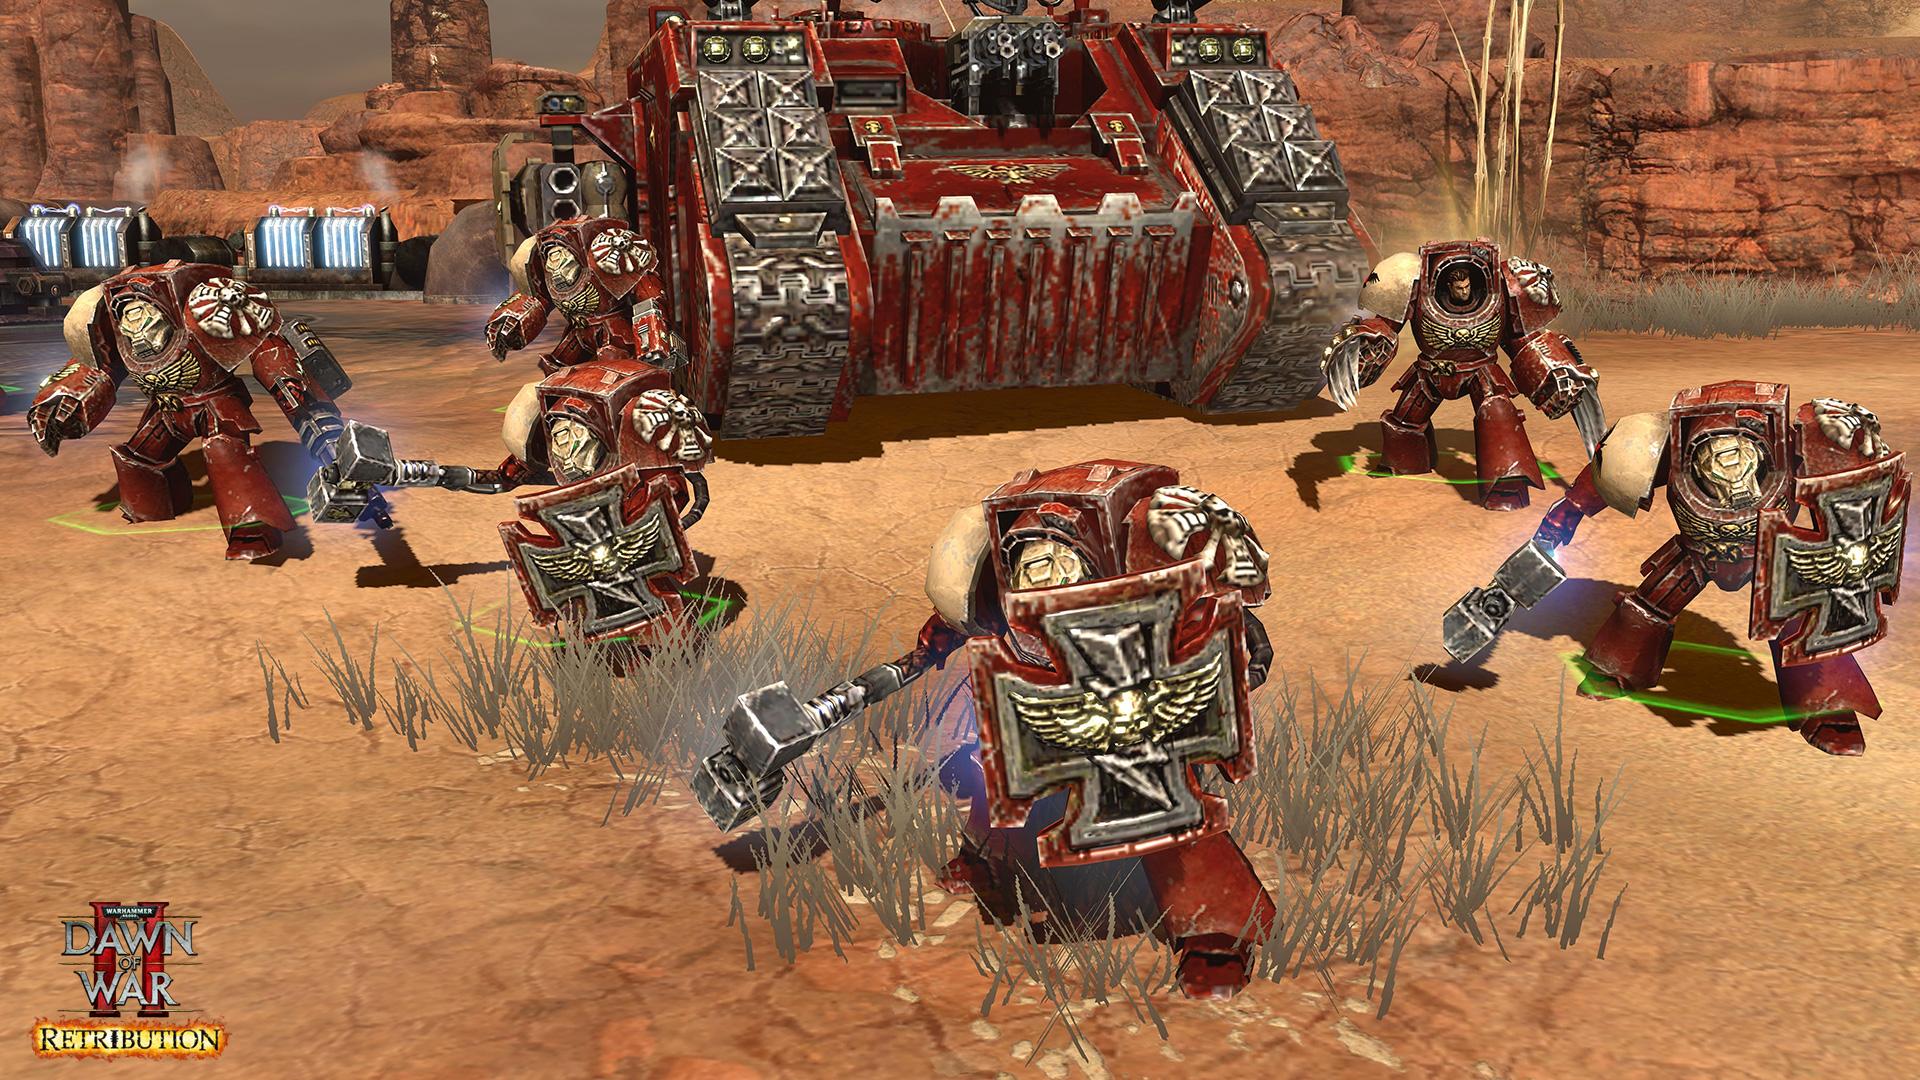 Warhammer 40,000: Dawn of War II - Retribution screenshot